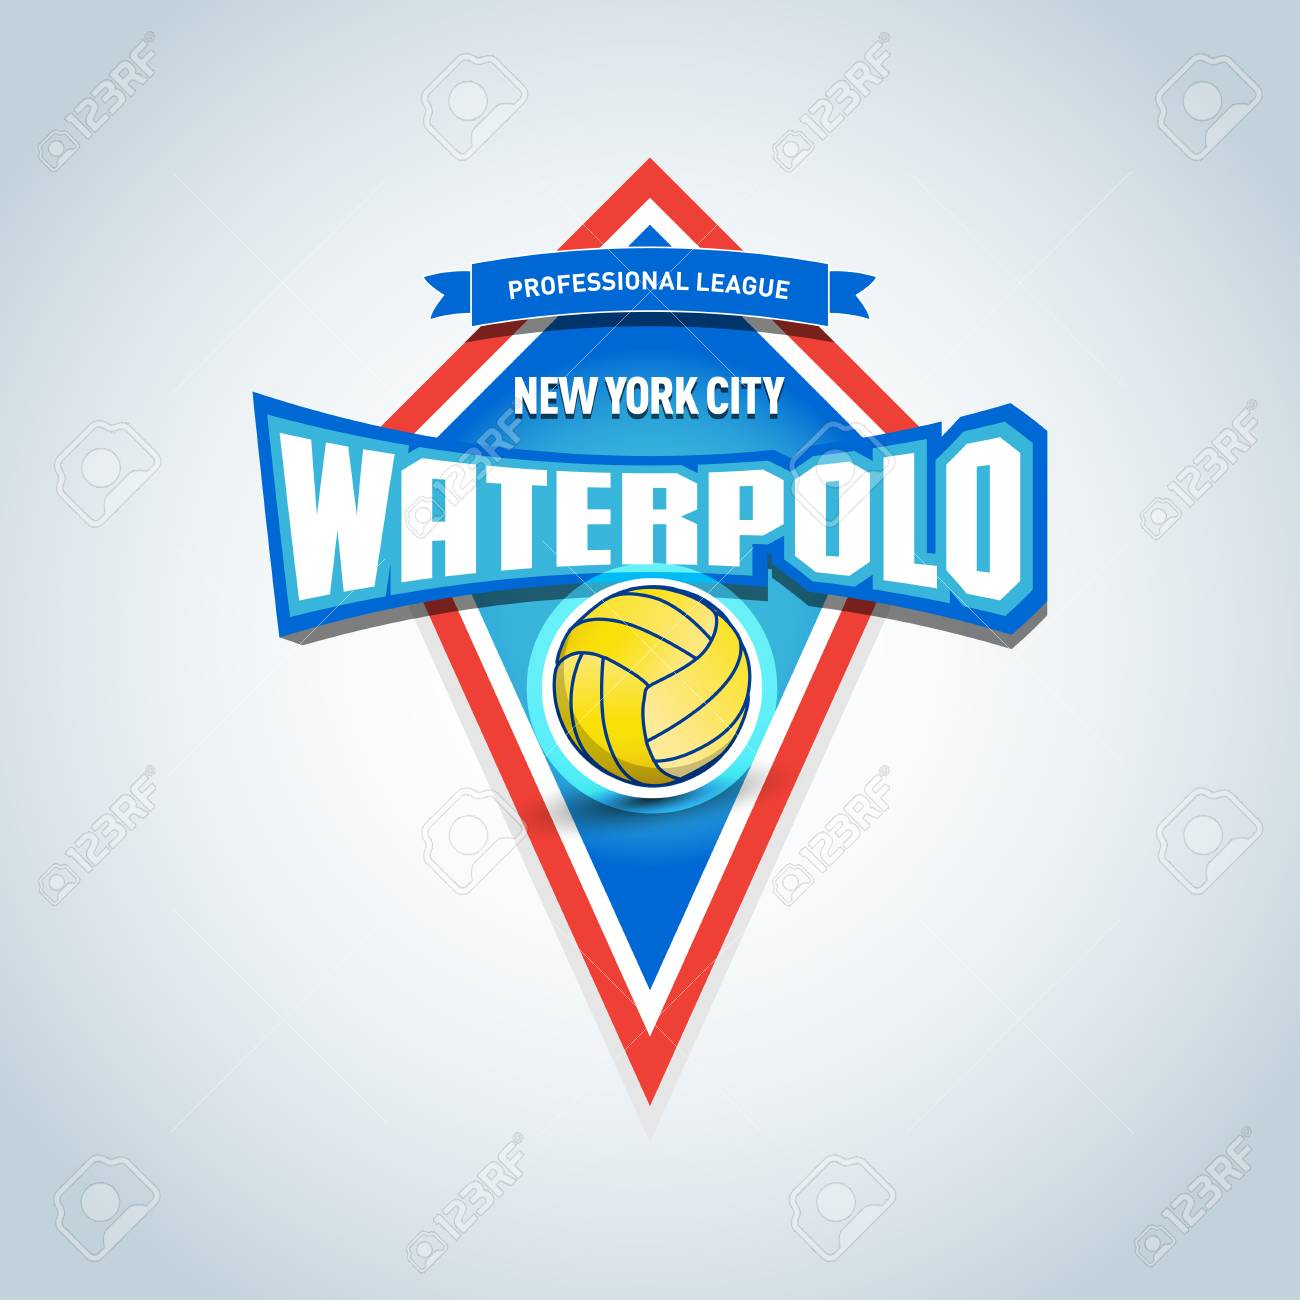 ae7c8b18c Water polo isolated badge logo, sport t-shirt graphics. Club emblem,  college league logo, sport tournament, championship design